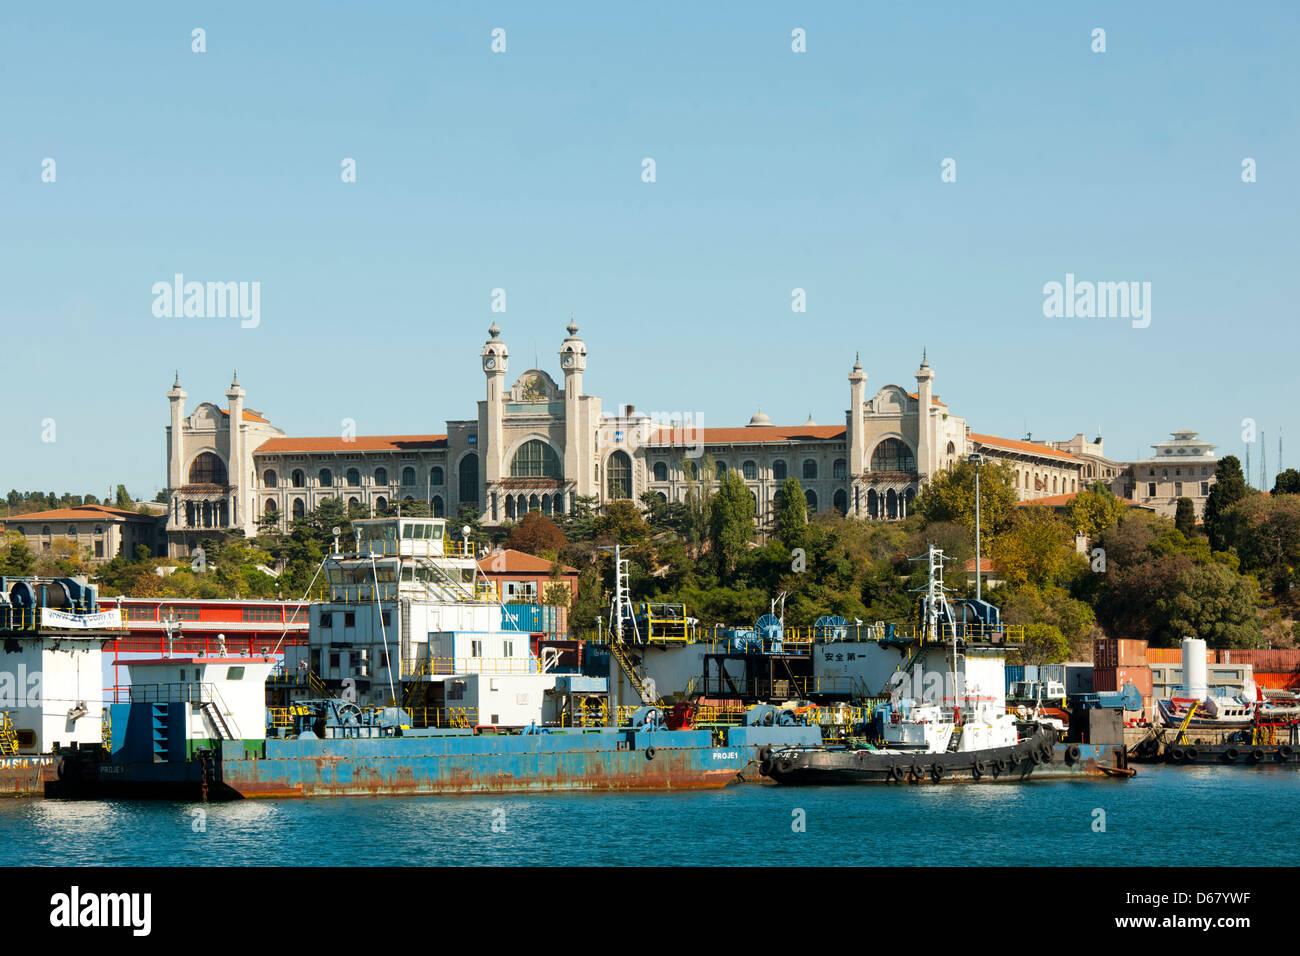 Türkei, Istanbul, Üsküdar, Industrie-Hafen dahinter die Marmara Universität - Stock Image